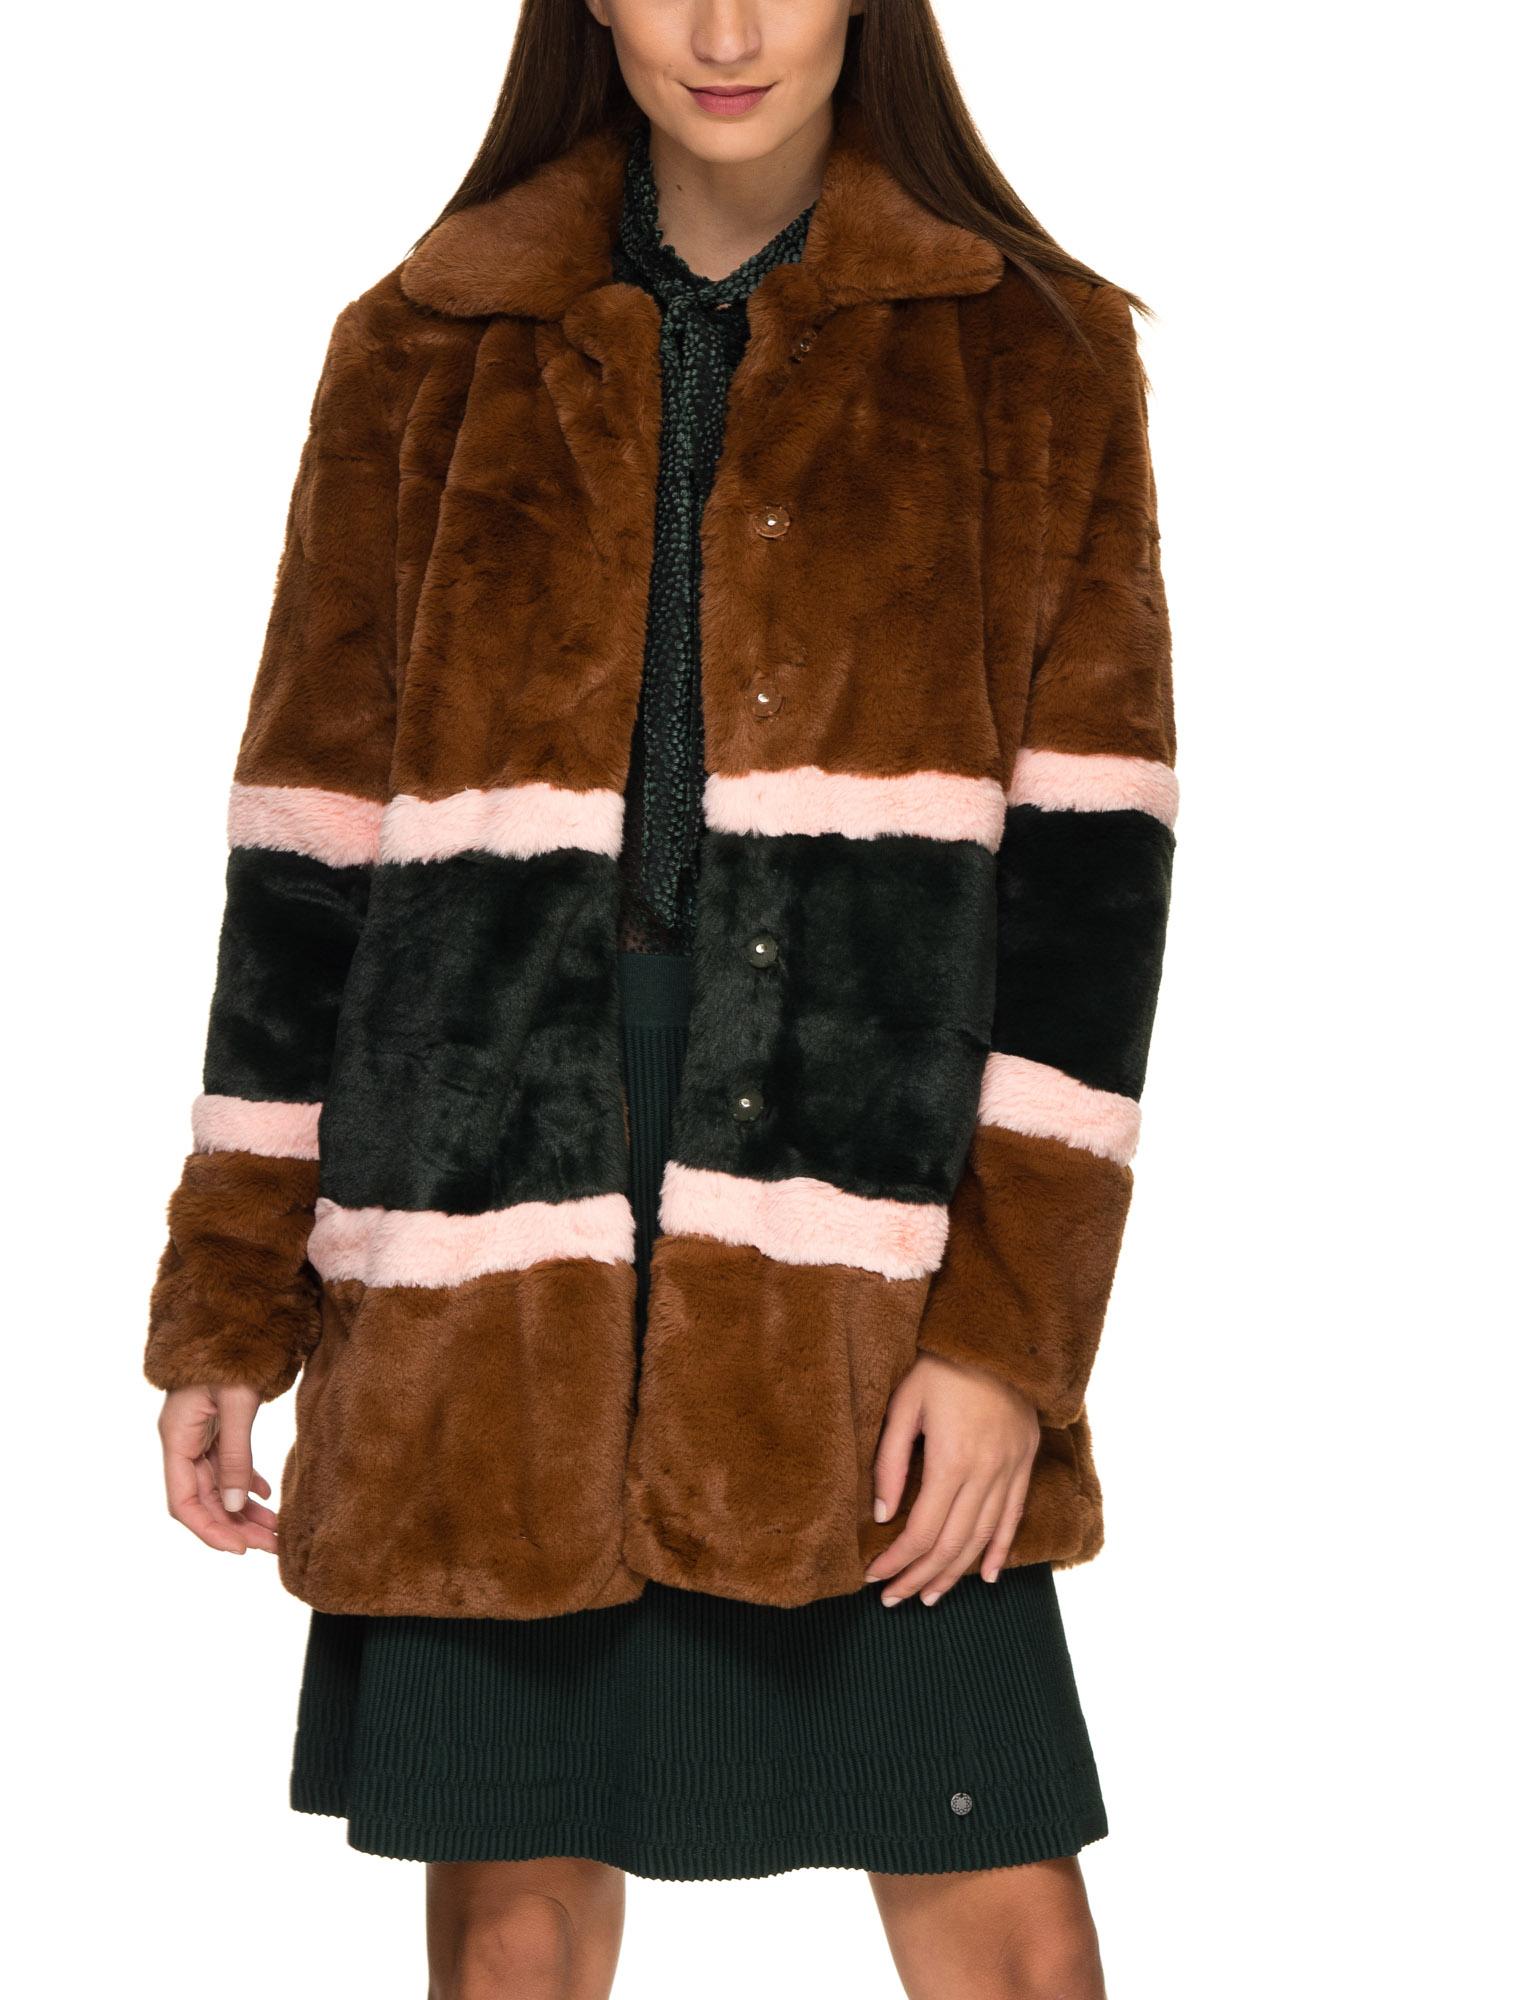 e2d7475e Numph Women's Dot Faux Fur Jacket Brown - Numph women's faux fur jacket by  the serie